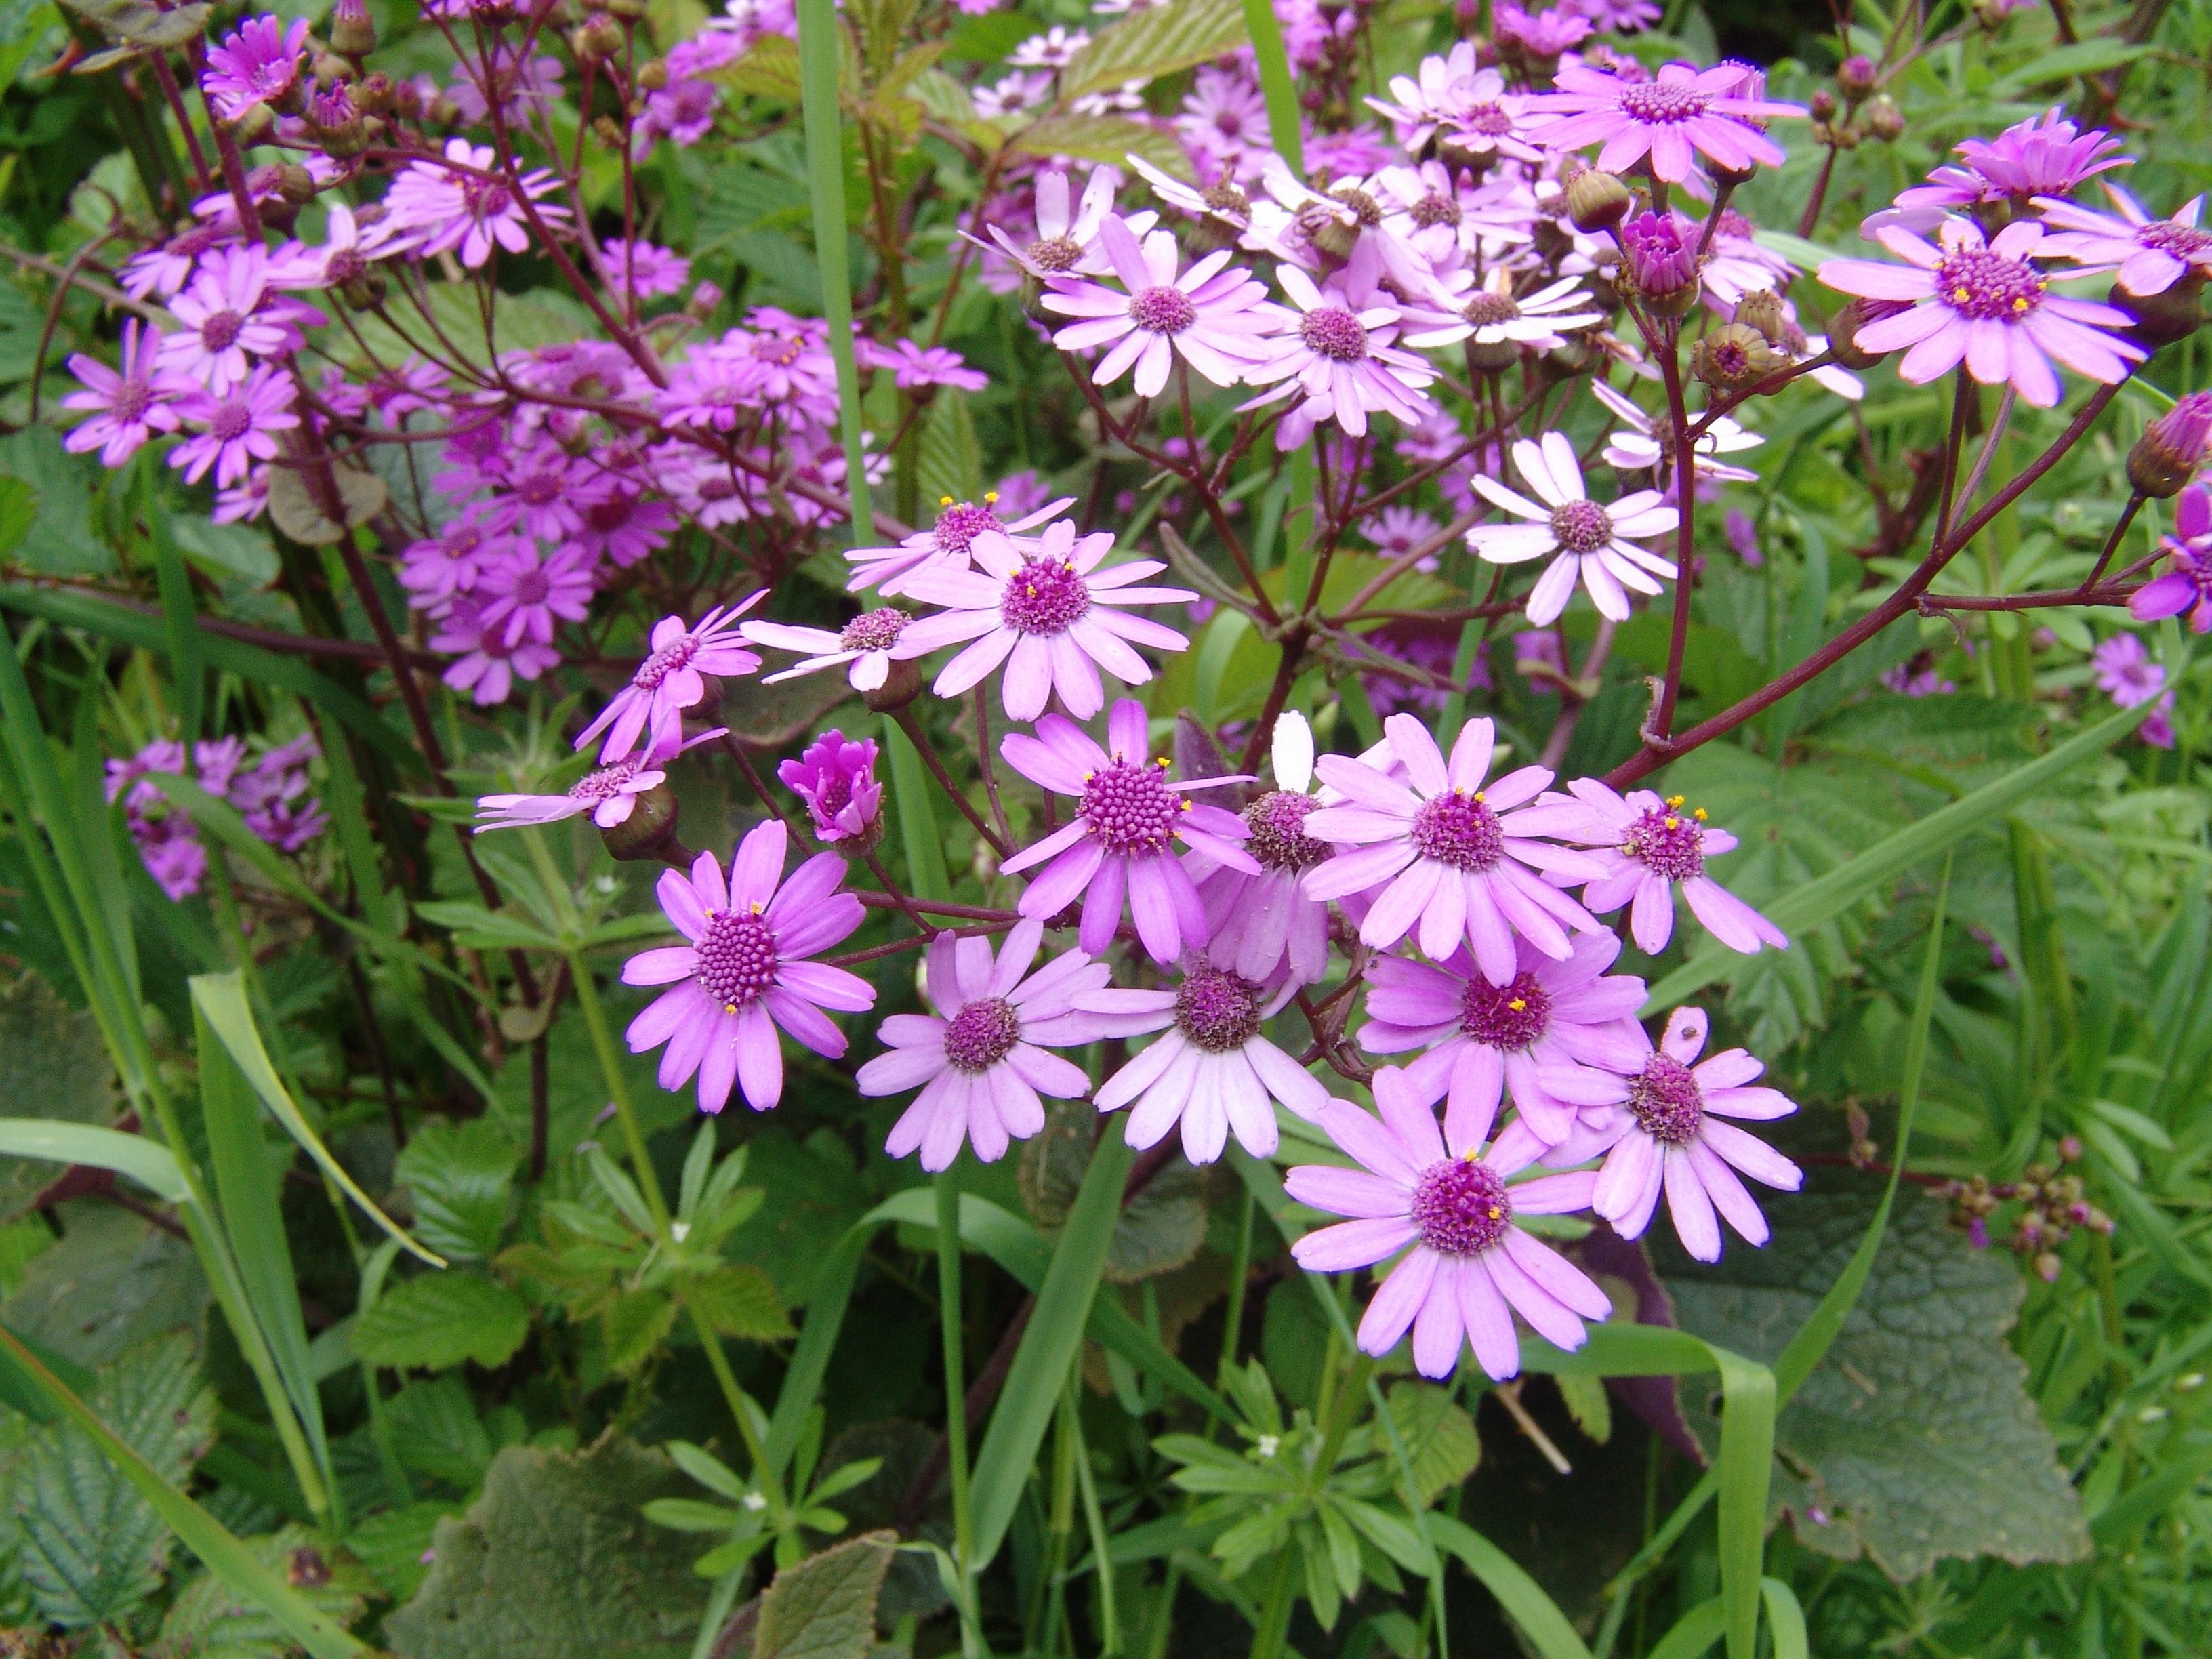 dsc09888-flores-pericallis-cruenta-a-10.jpg